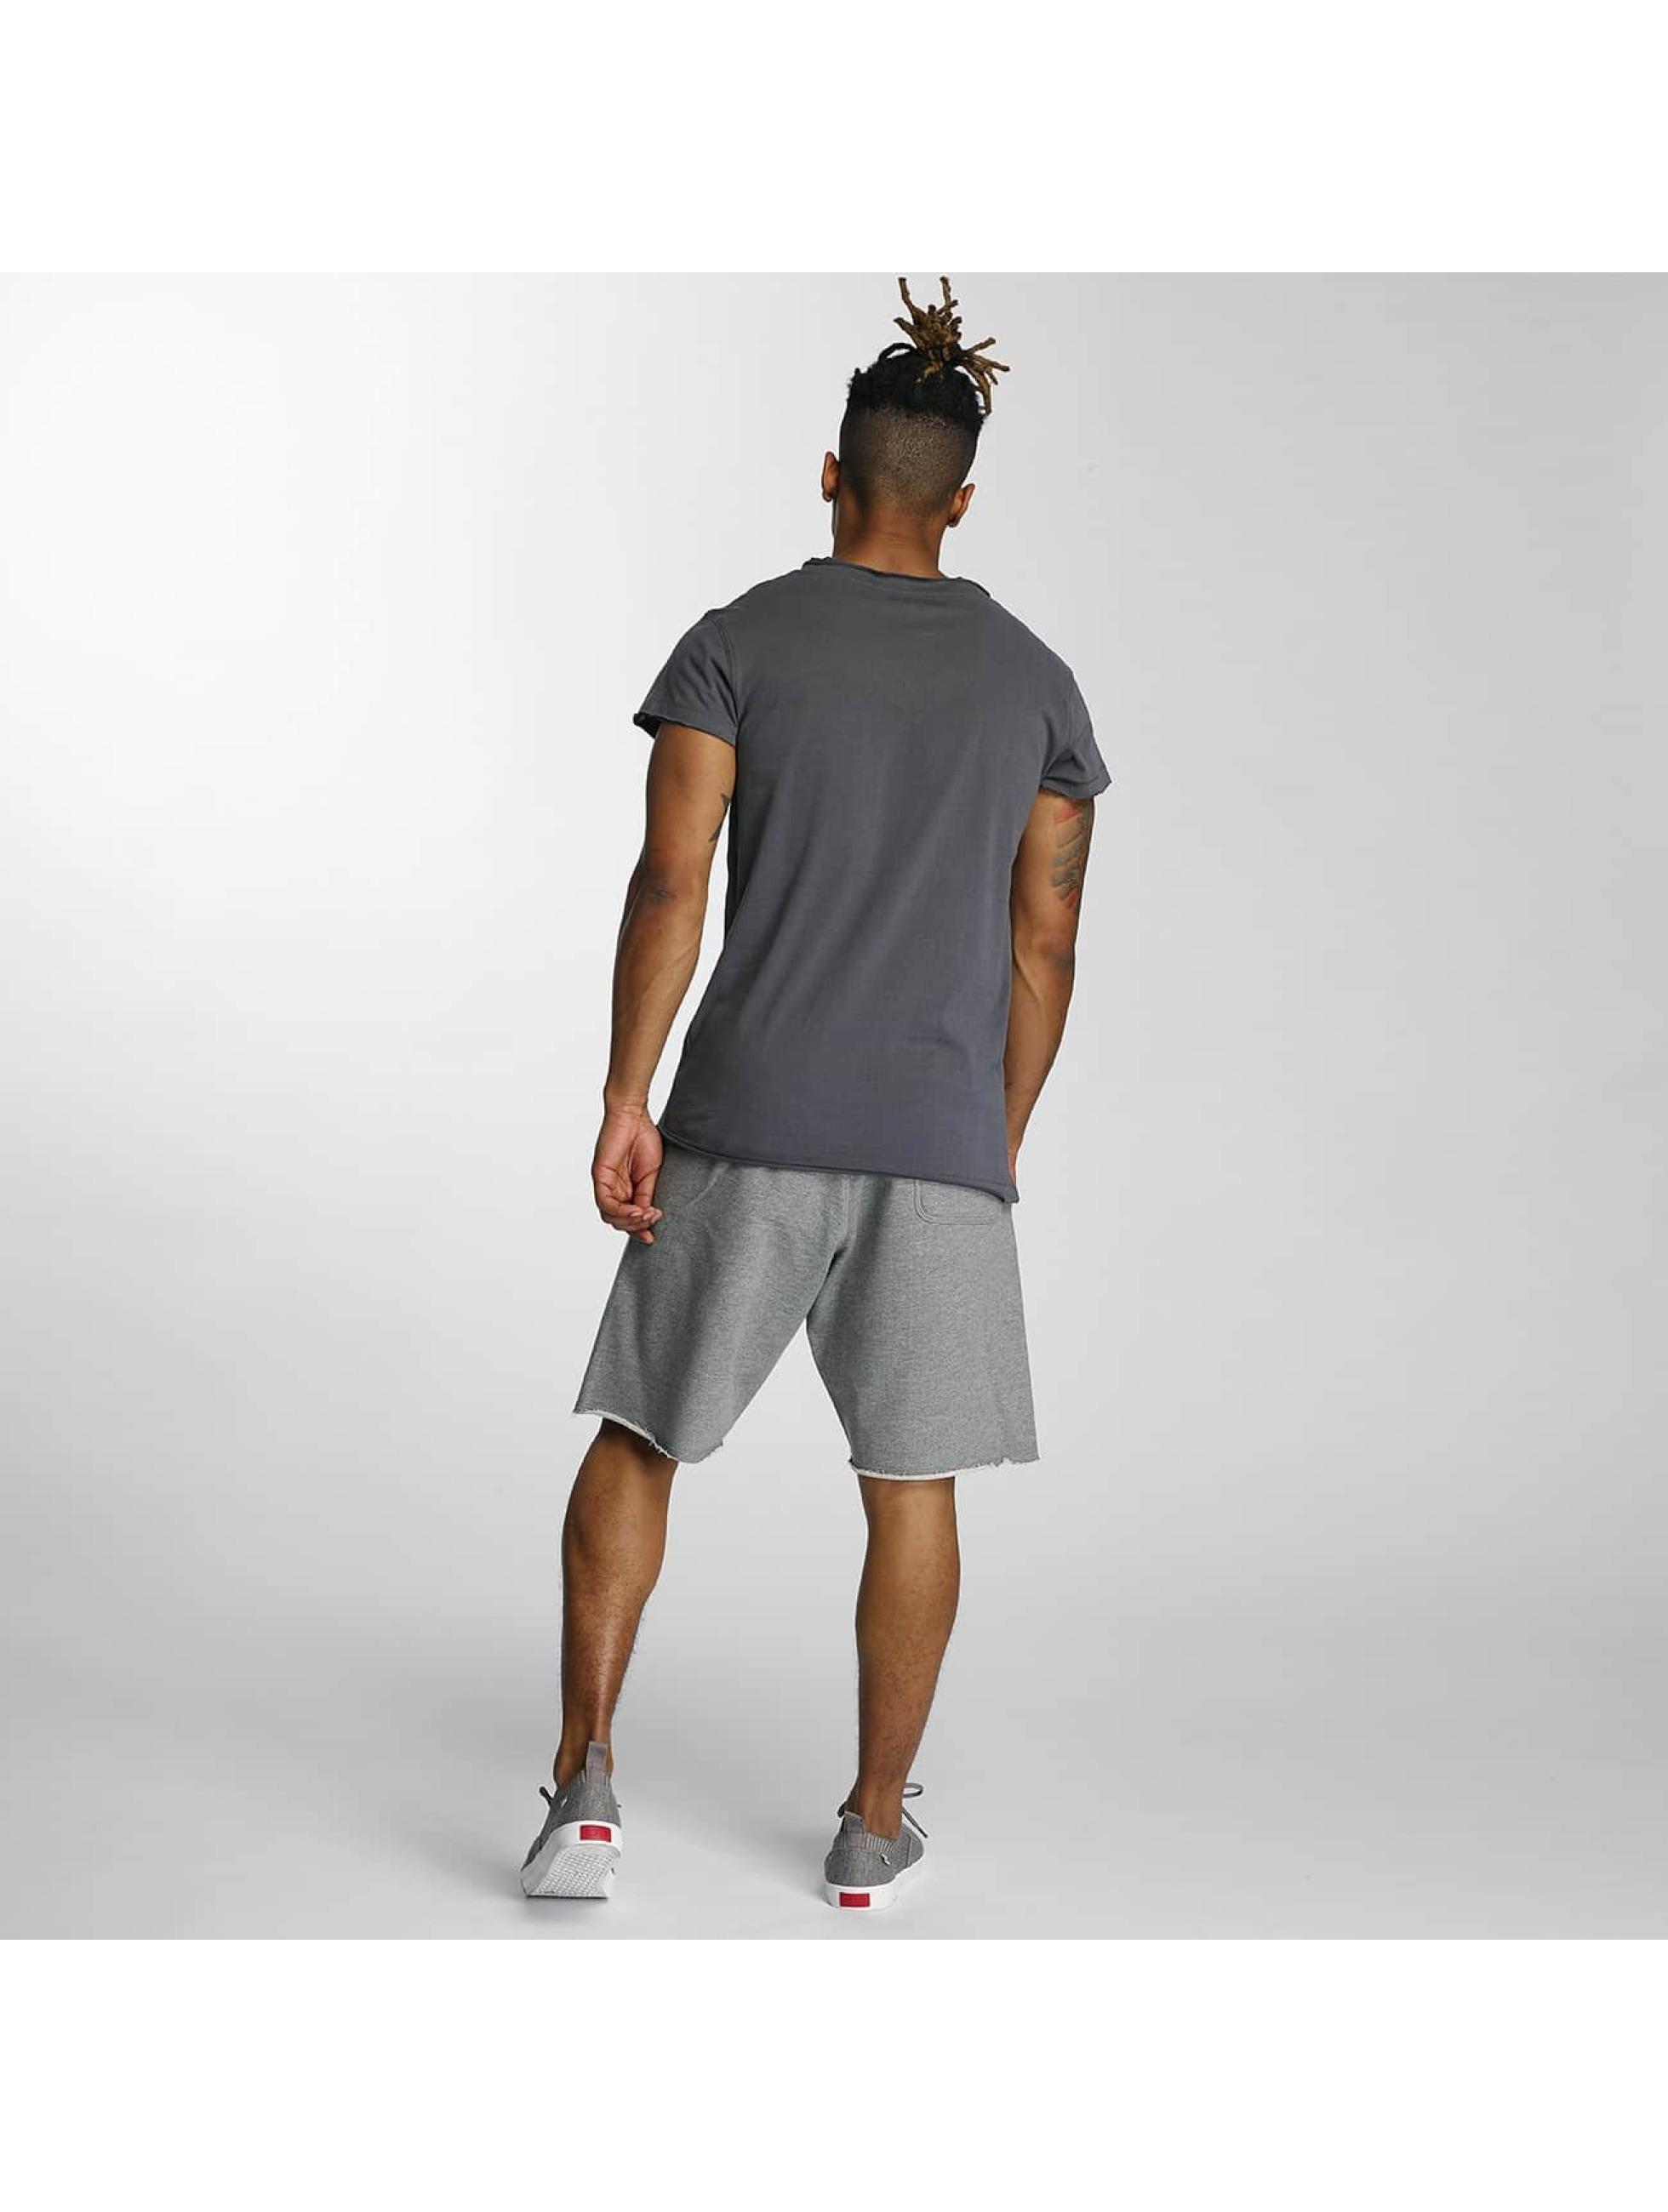 Devilsfruit T-Shirt Open grau